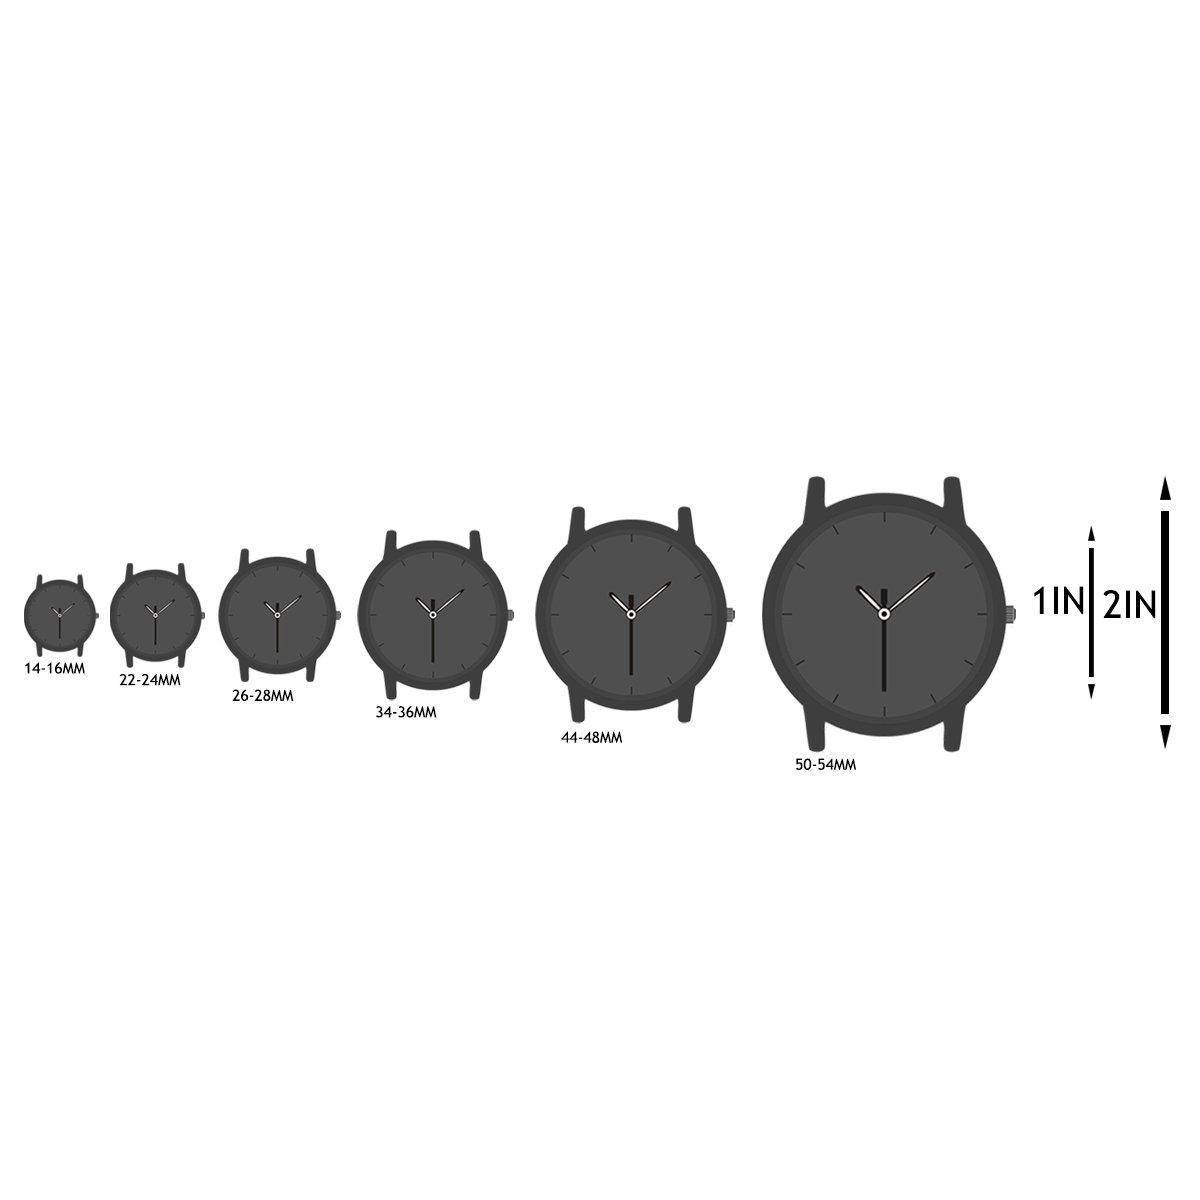 ManChDa Big Case 47MM XL Automatic Mechanical Crystal Black Leather Wrist Watch + Gift Box by ManChDa (Image #6)